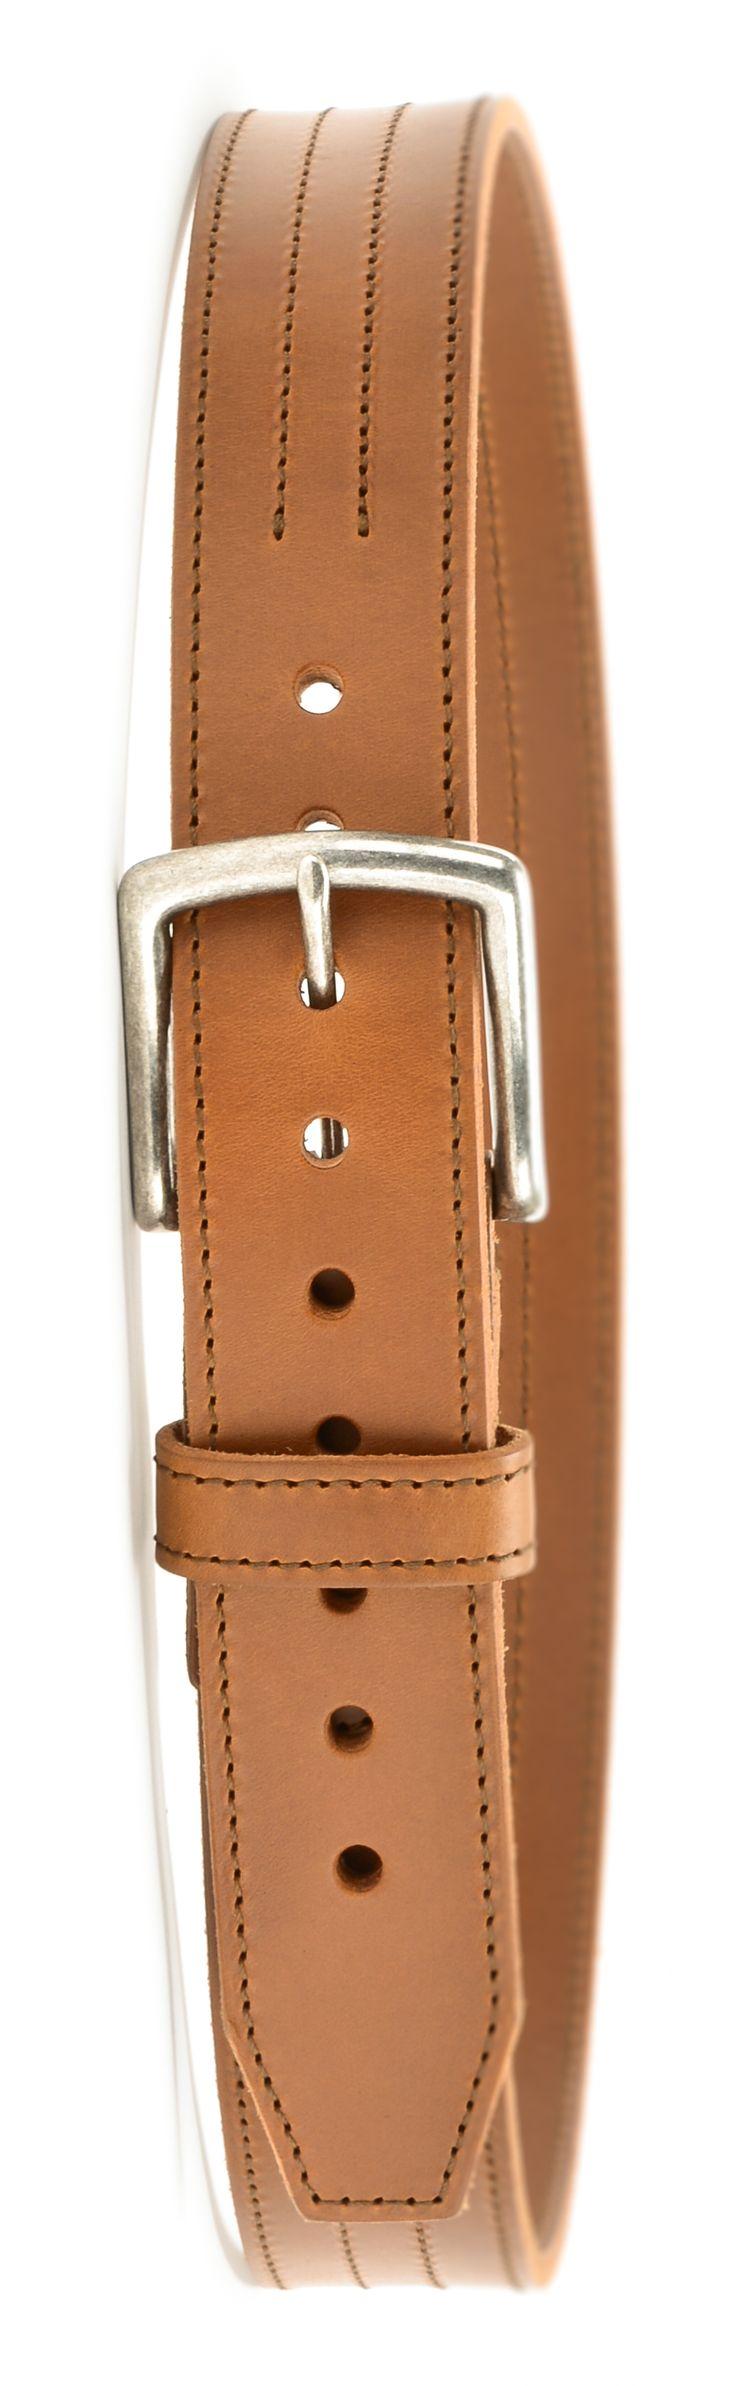 Saddleback leather four stitch belt in tobacco brown